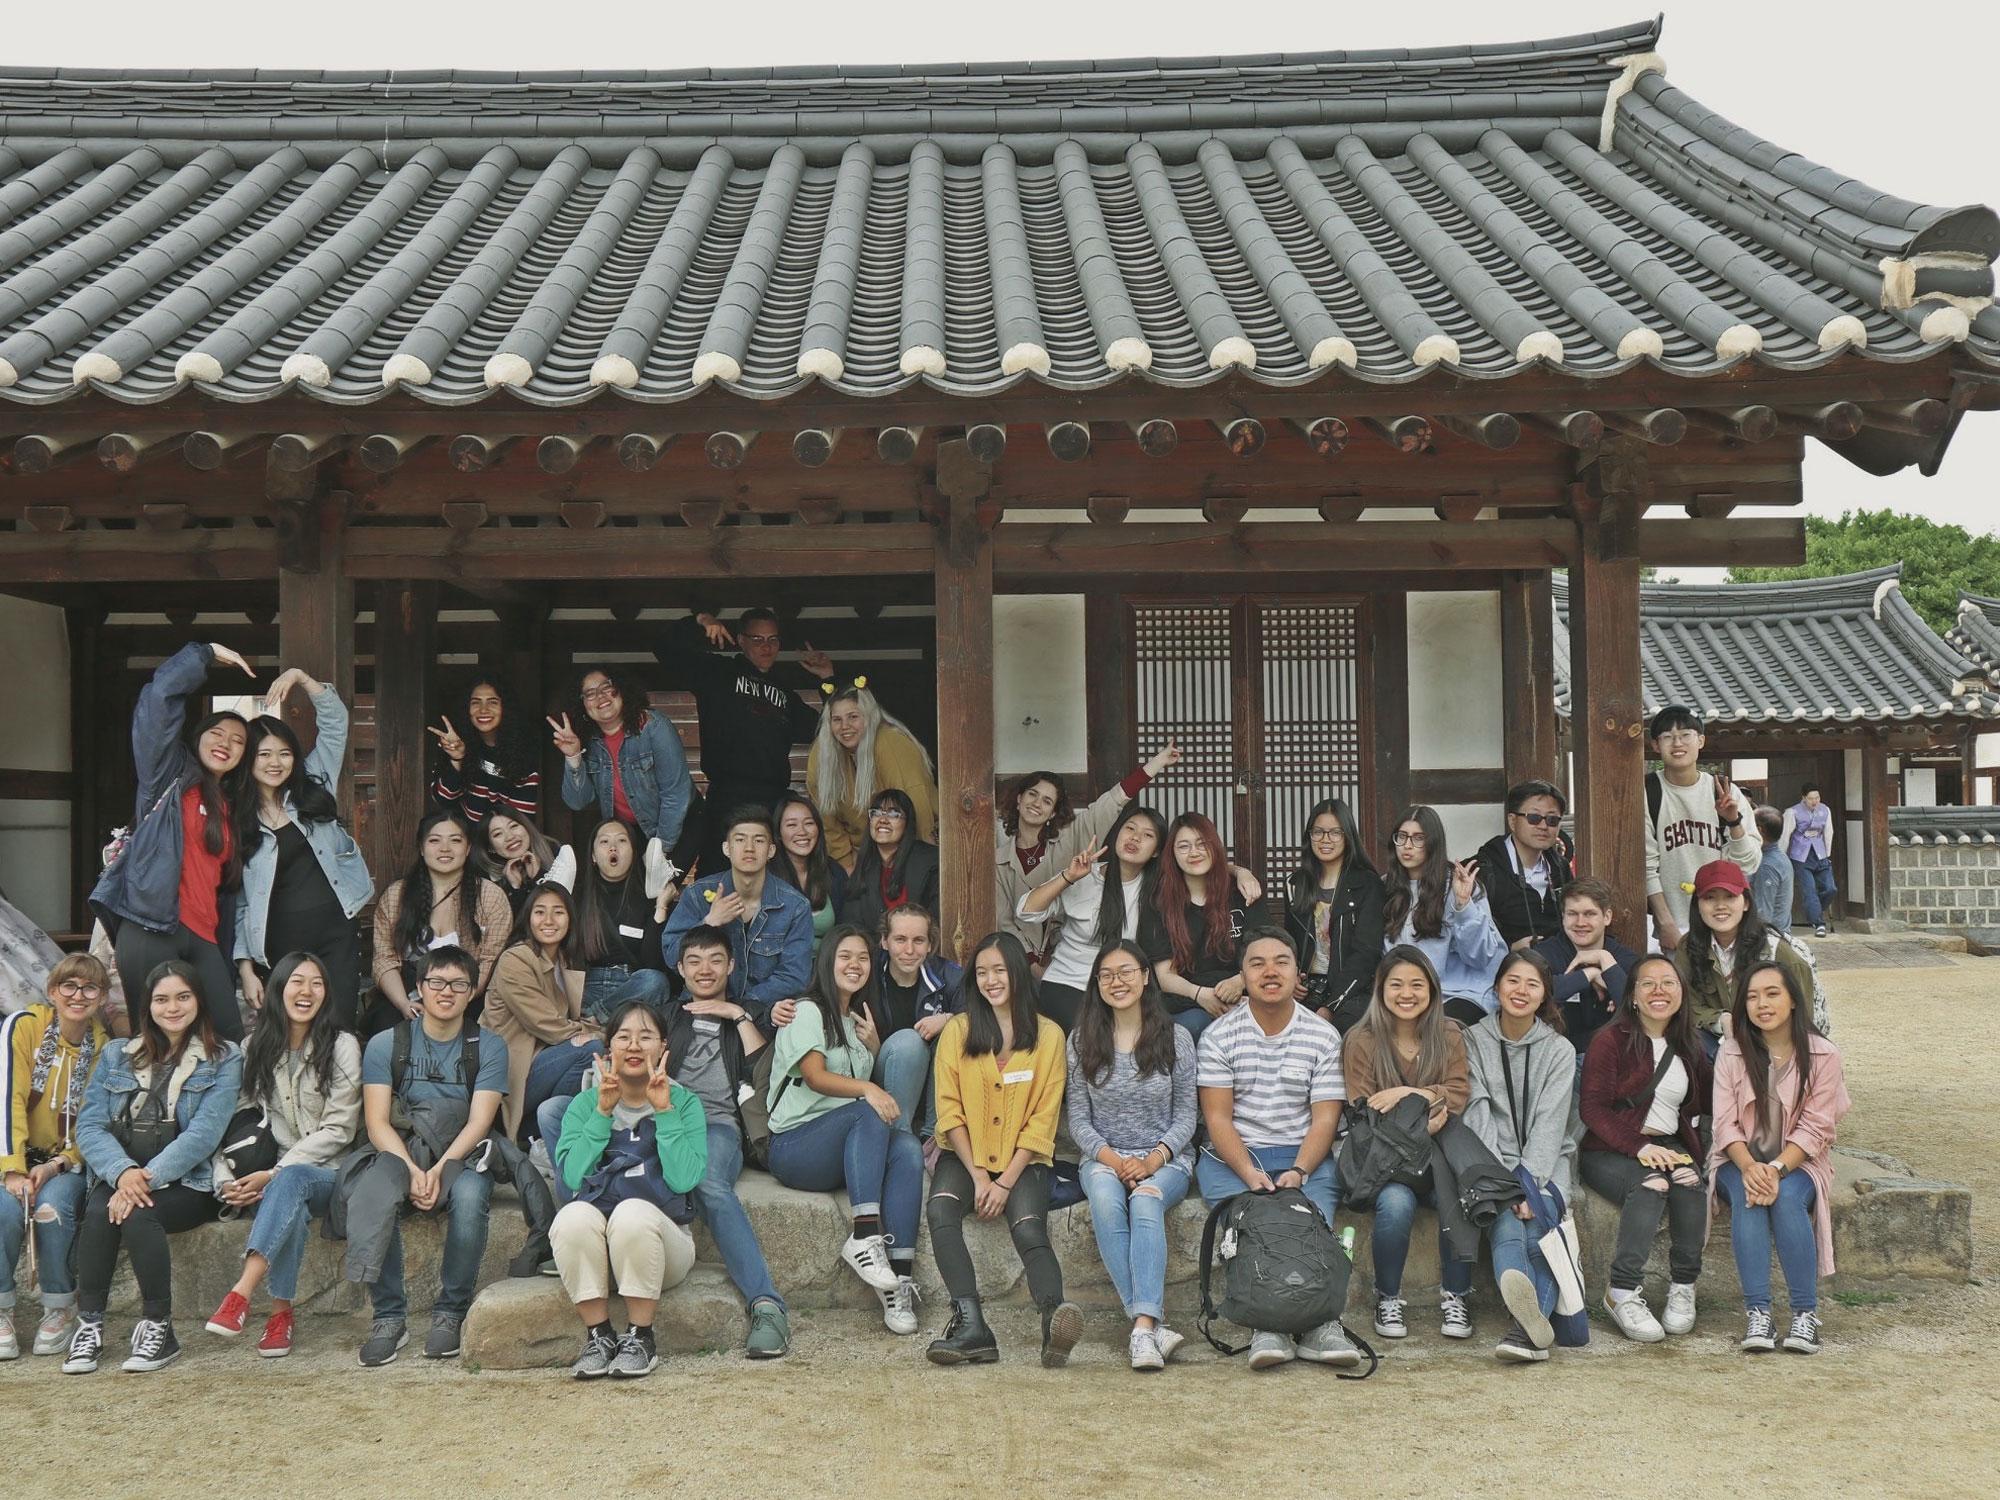 A group photo of students at Hanok Village, Jeonju